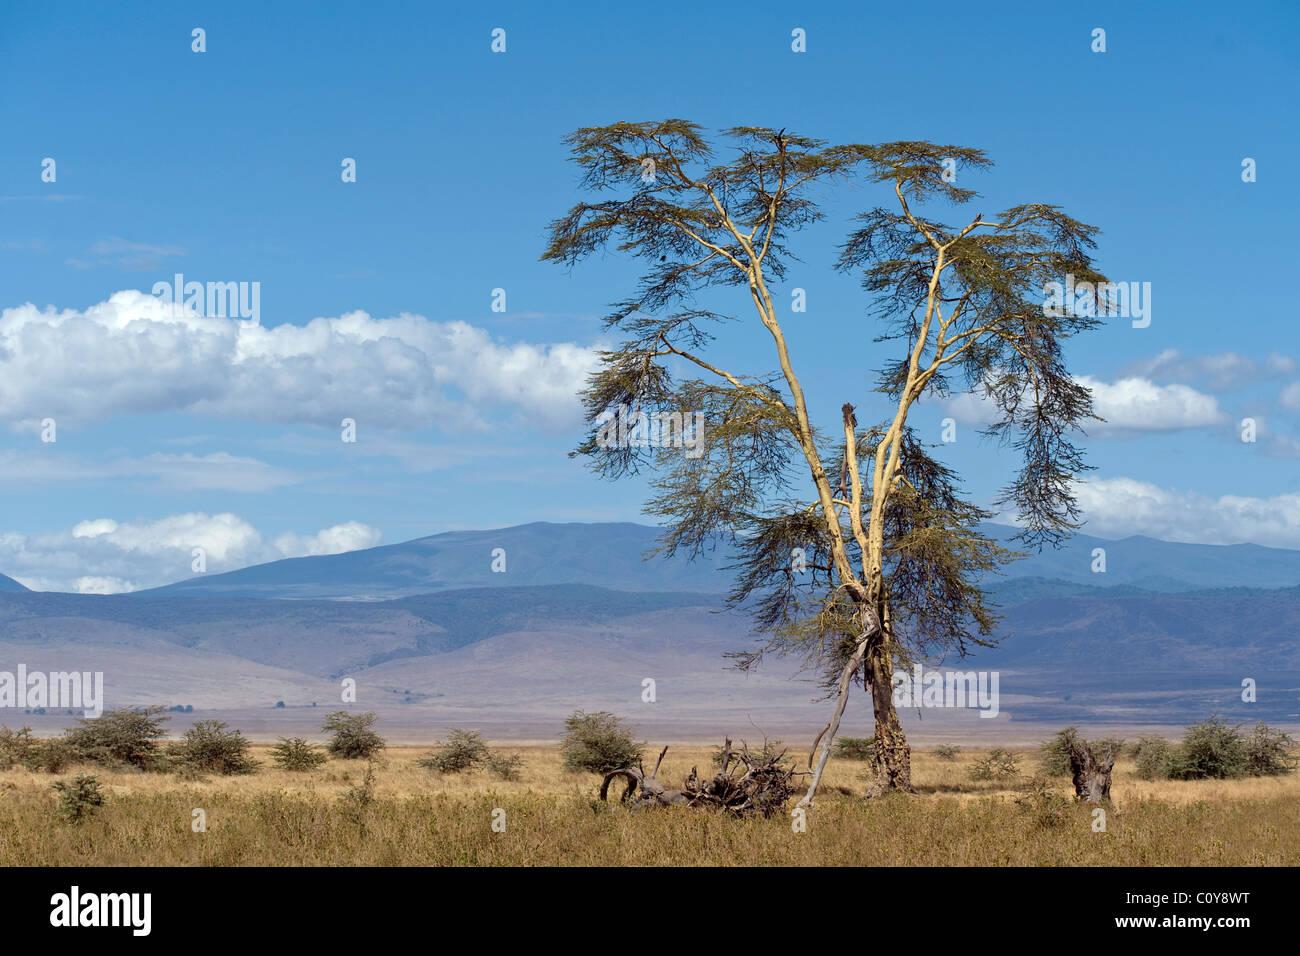 Yellow barked Acacia , Acacia xanthophloea, in Ngorongoro Crater Tanzania - Stock Image